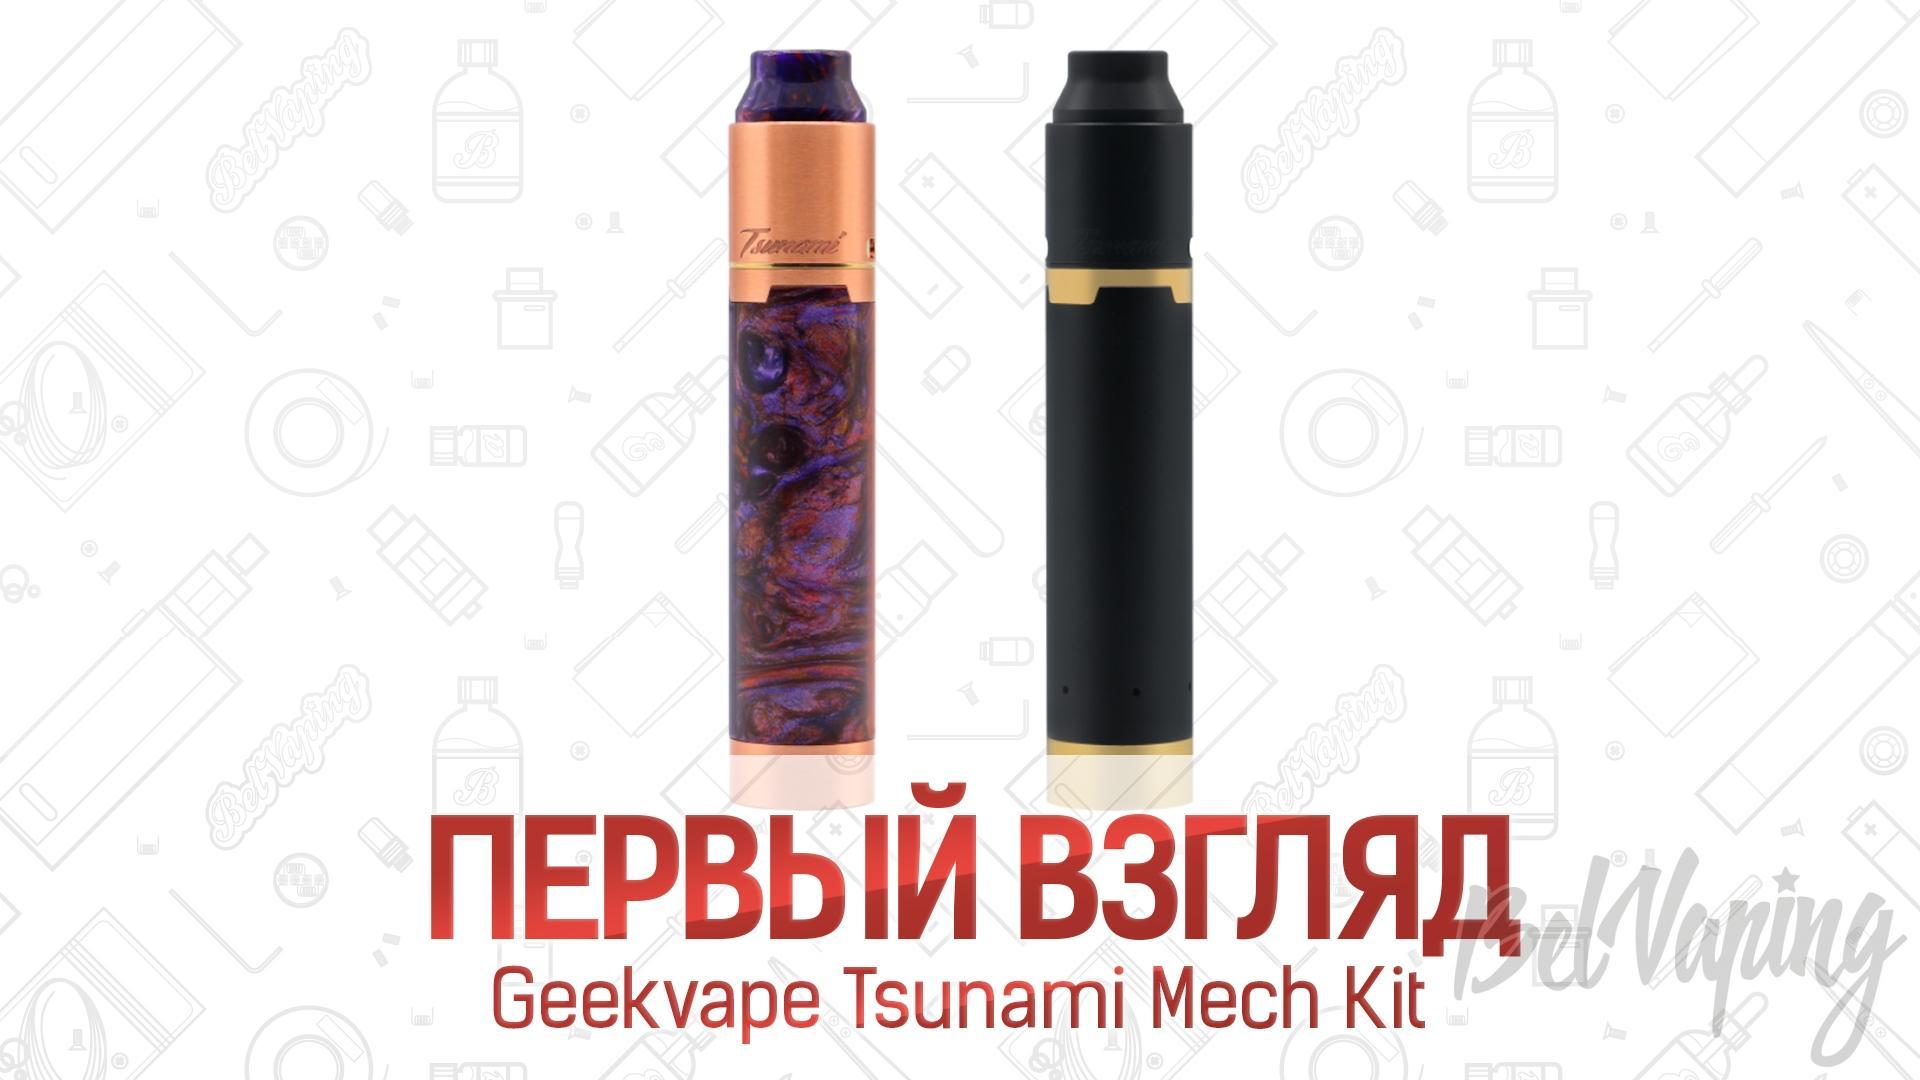 GeekVape Tsunami Mech Kit. Первый взгляд